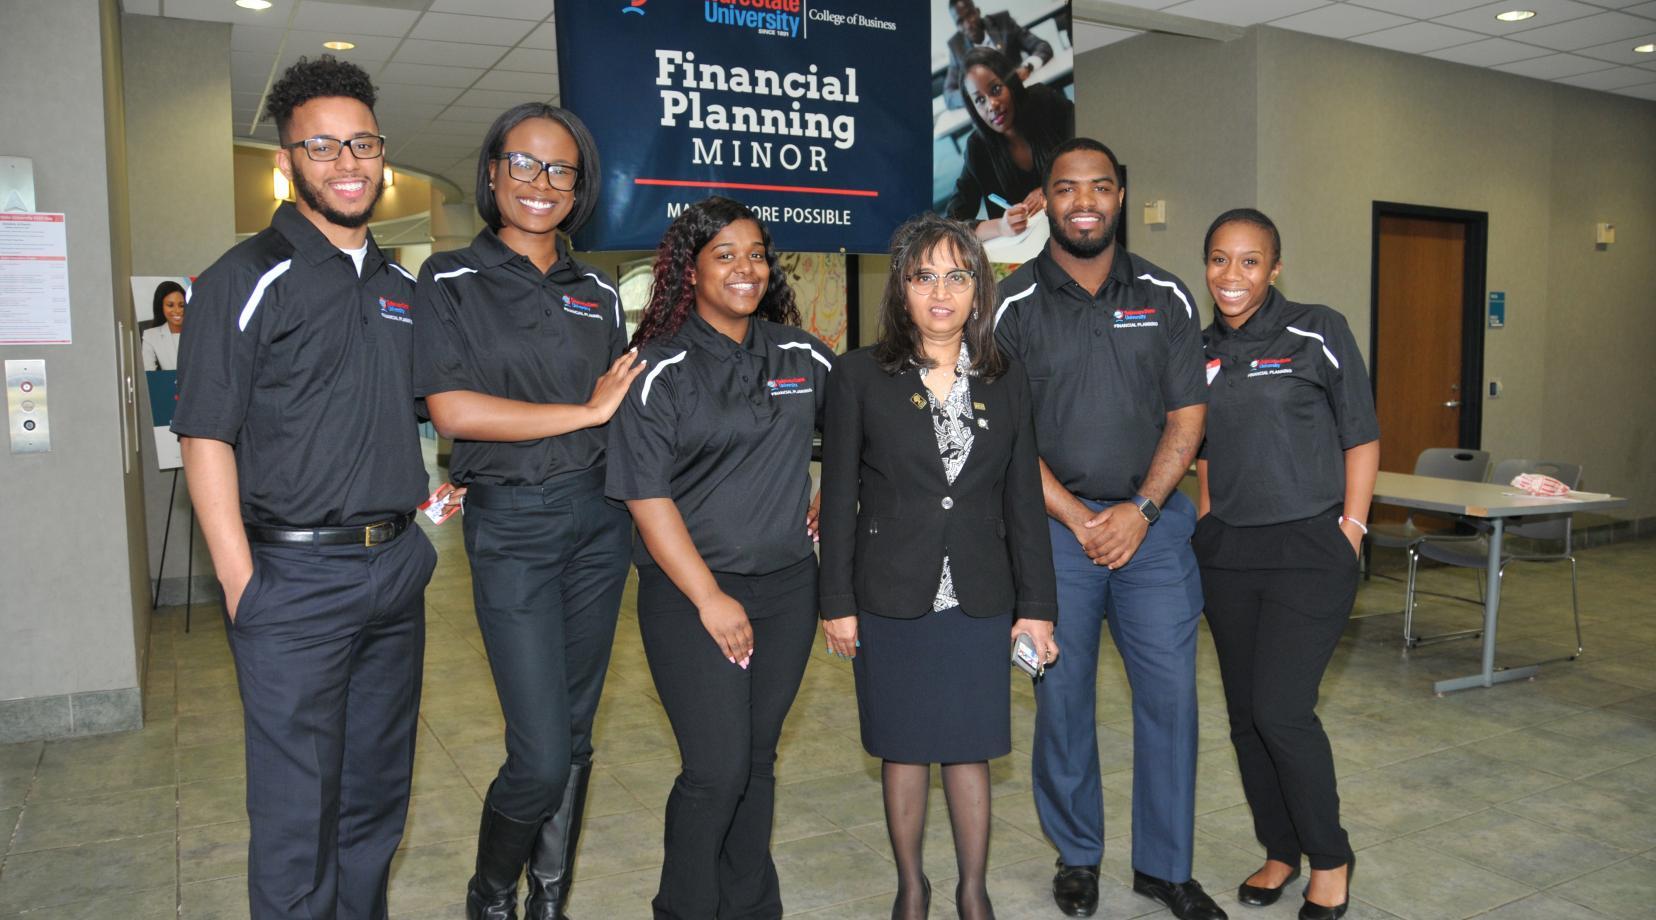 (L-r) Tabias Slaughter, Raven Wainwright, Whitney Douglas, Dr. Nandita Das, Reginald Adams and J'Lynn Drennan, represent the founding instructor and students of the new Financial Planning minor.